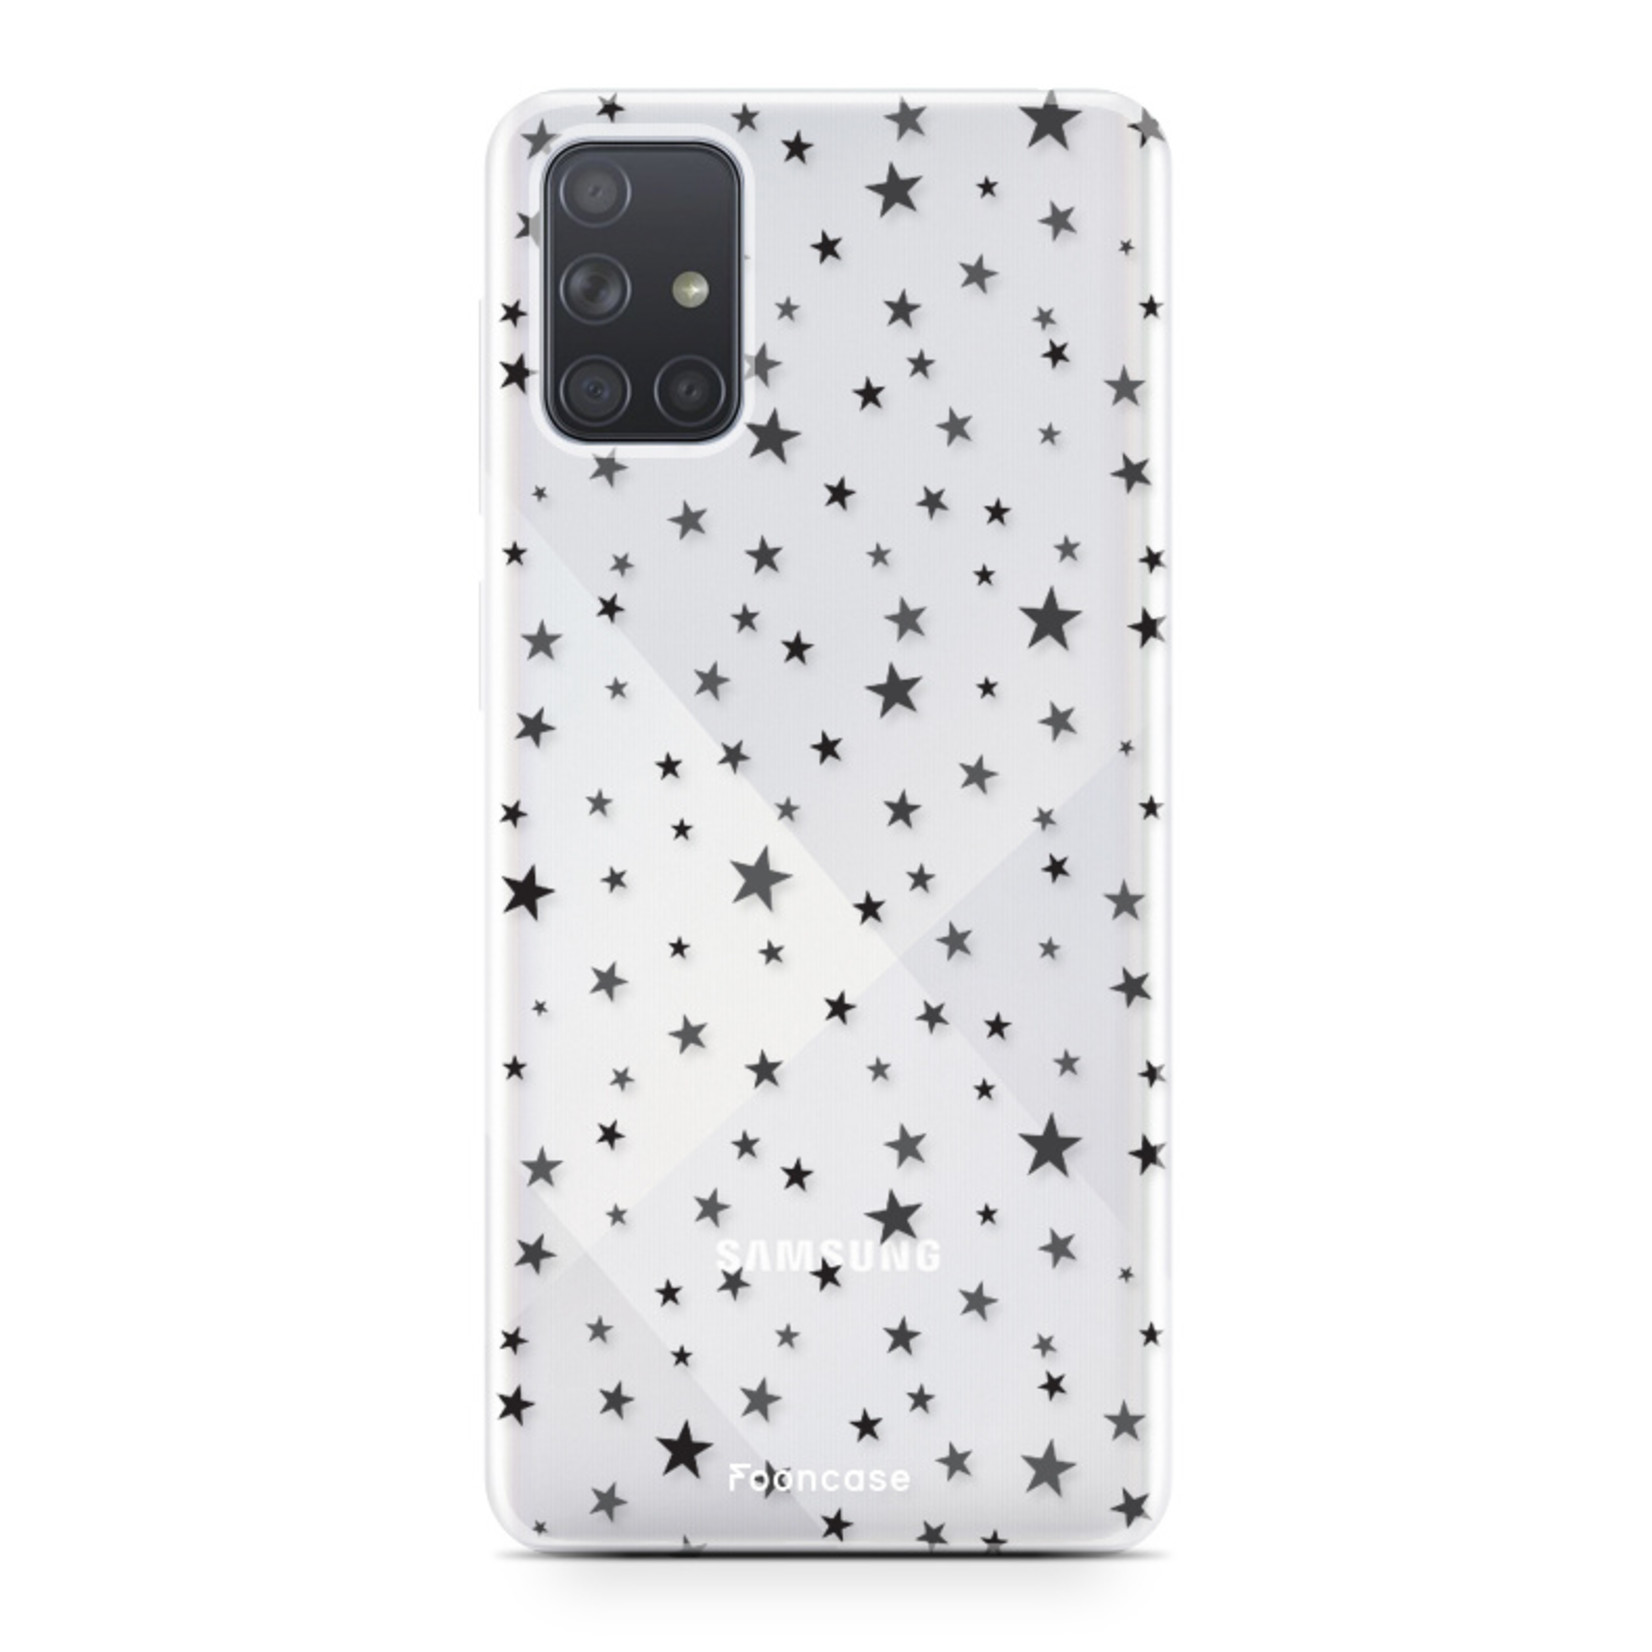 Samsung Galaxy A51 hoesje TPU Soft Case - Back Cover - Stars / Sterretjes